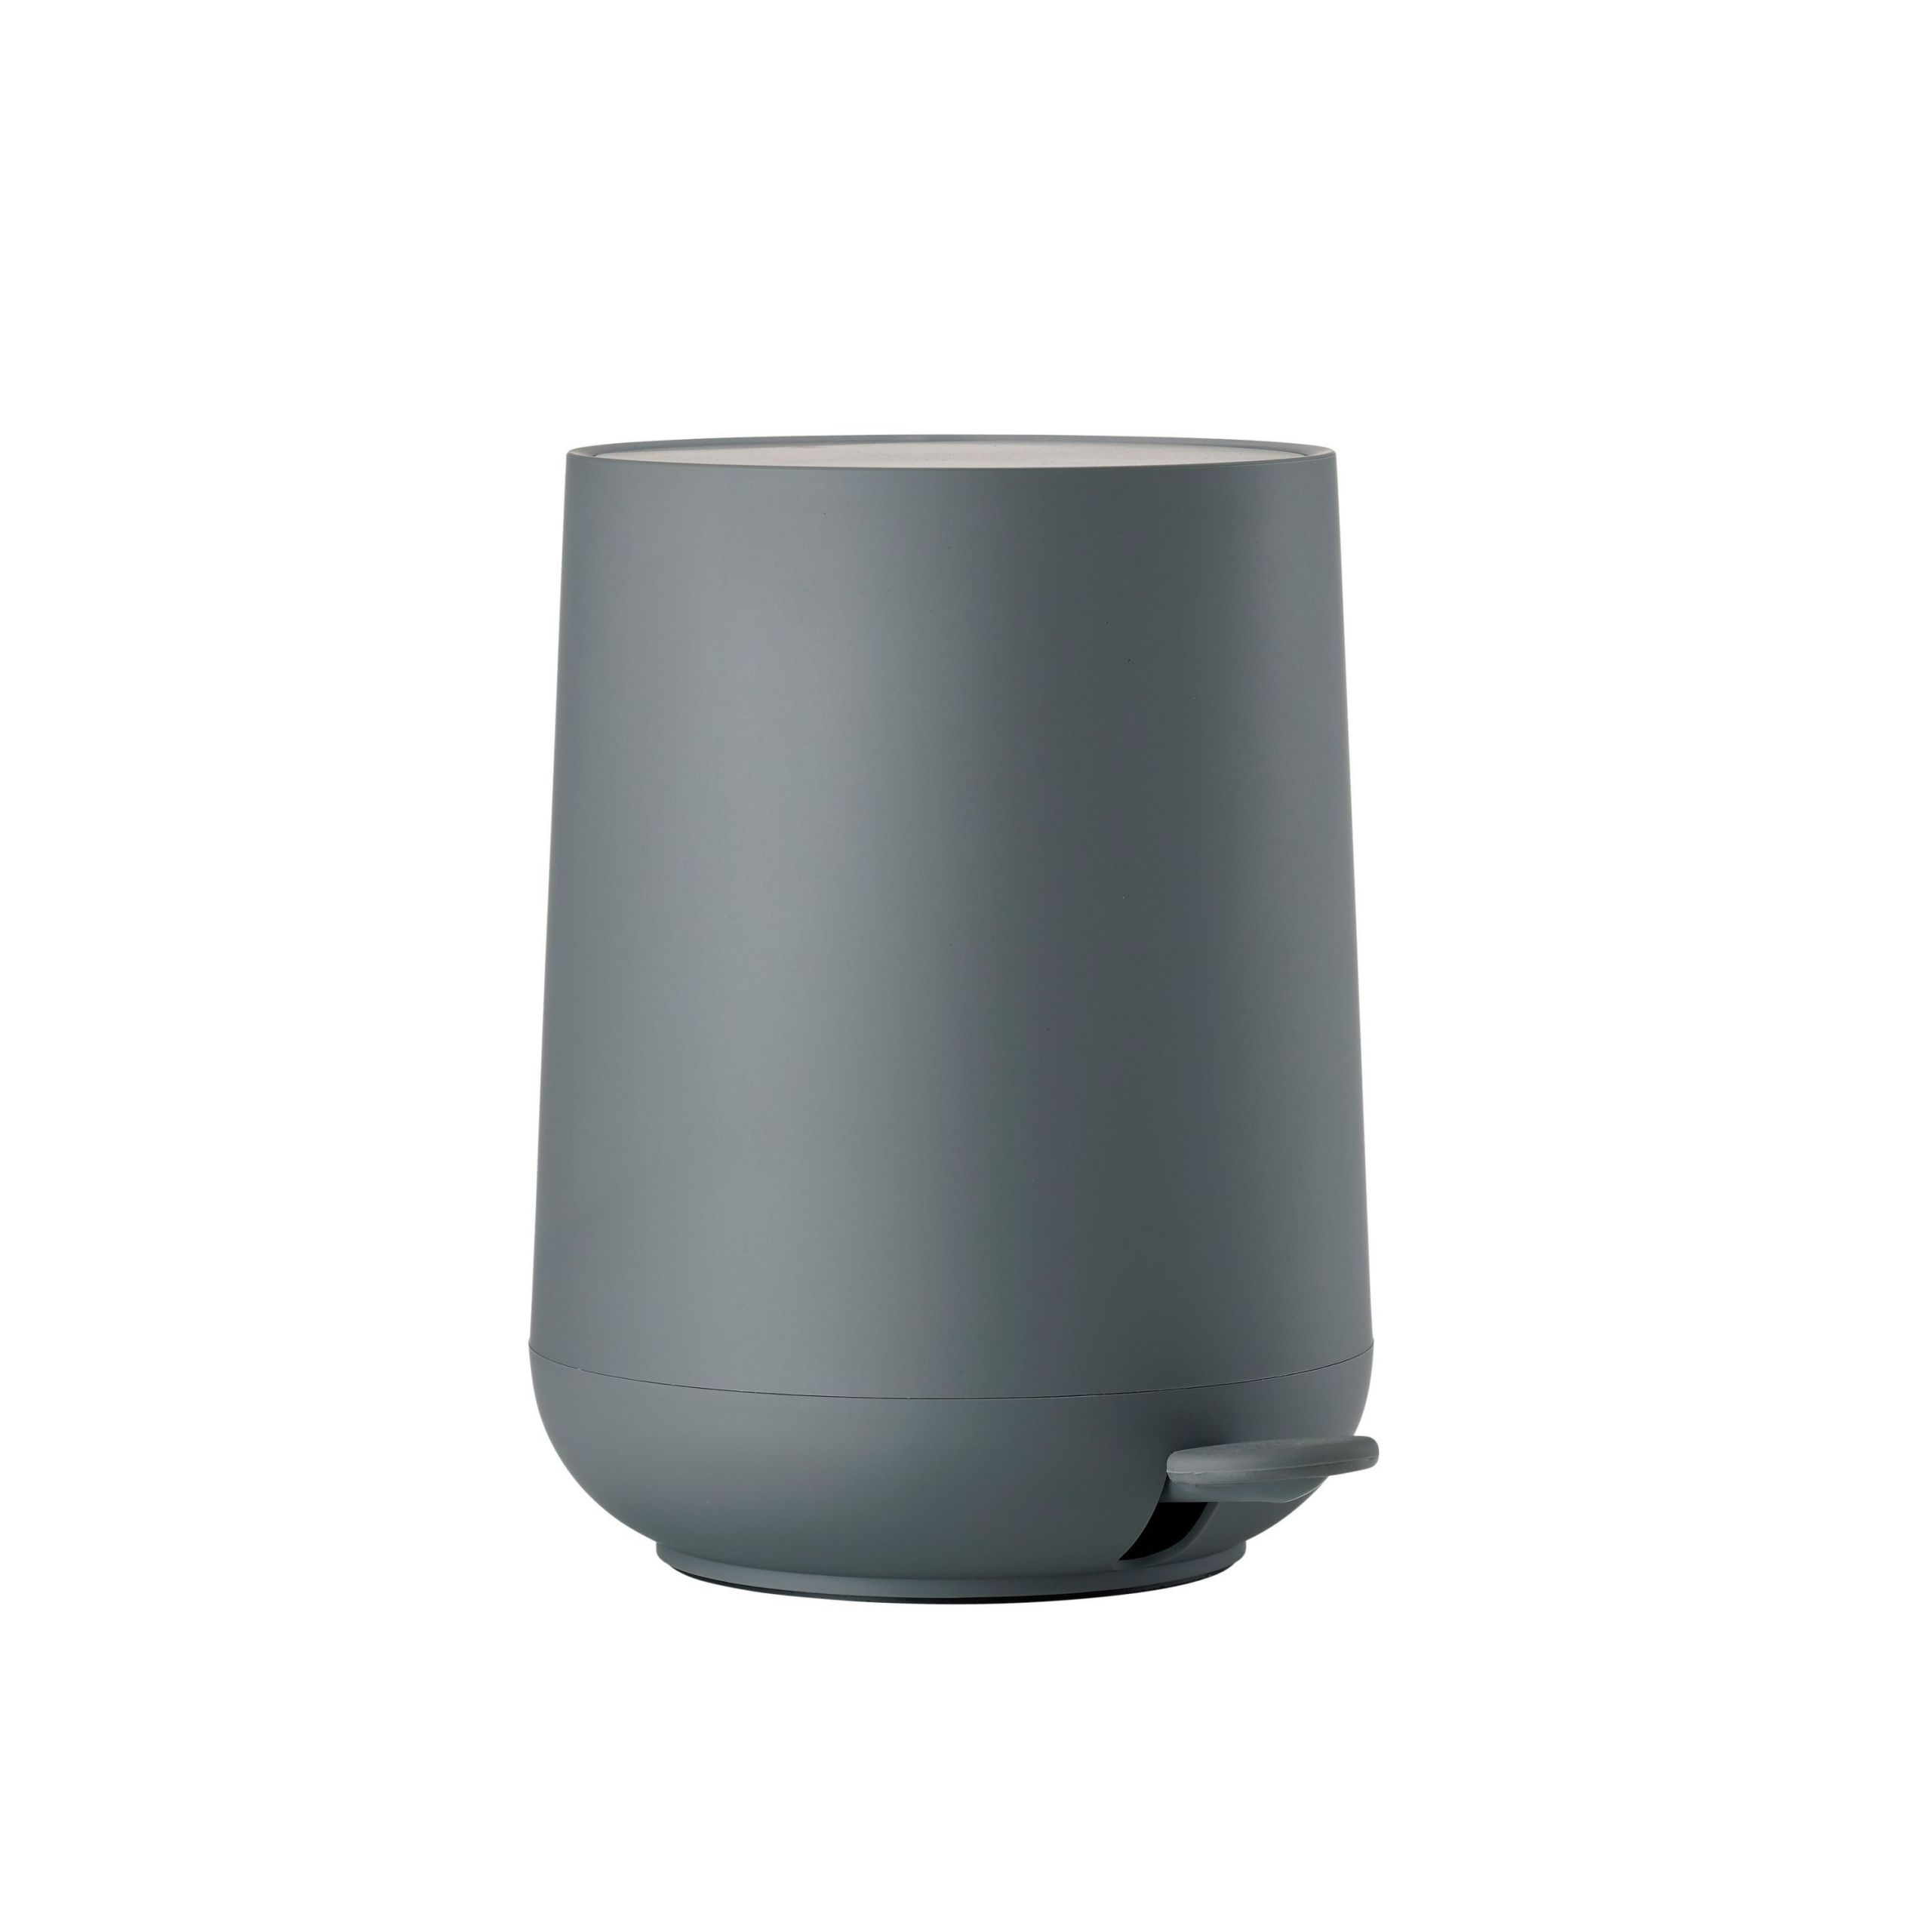 Pedal bin soft grey nova 3 L